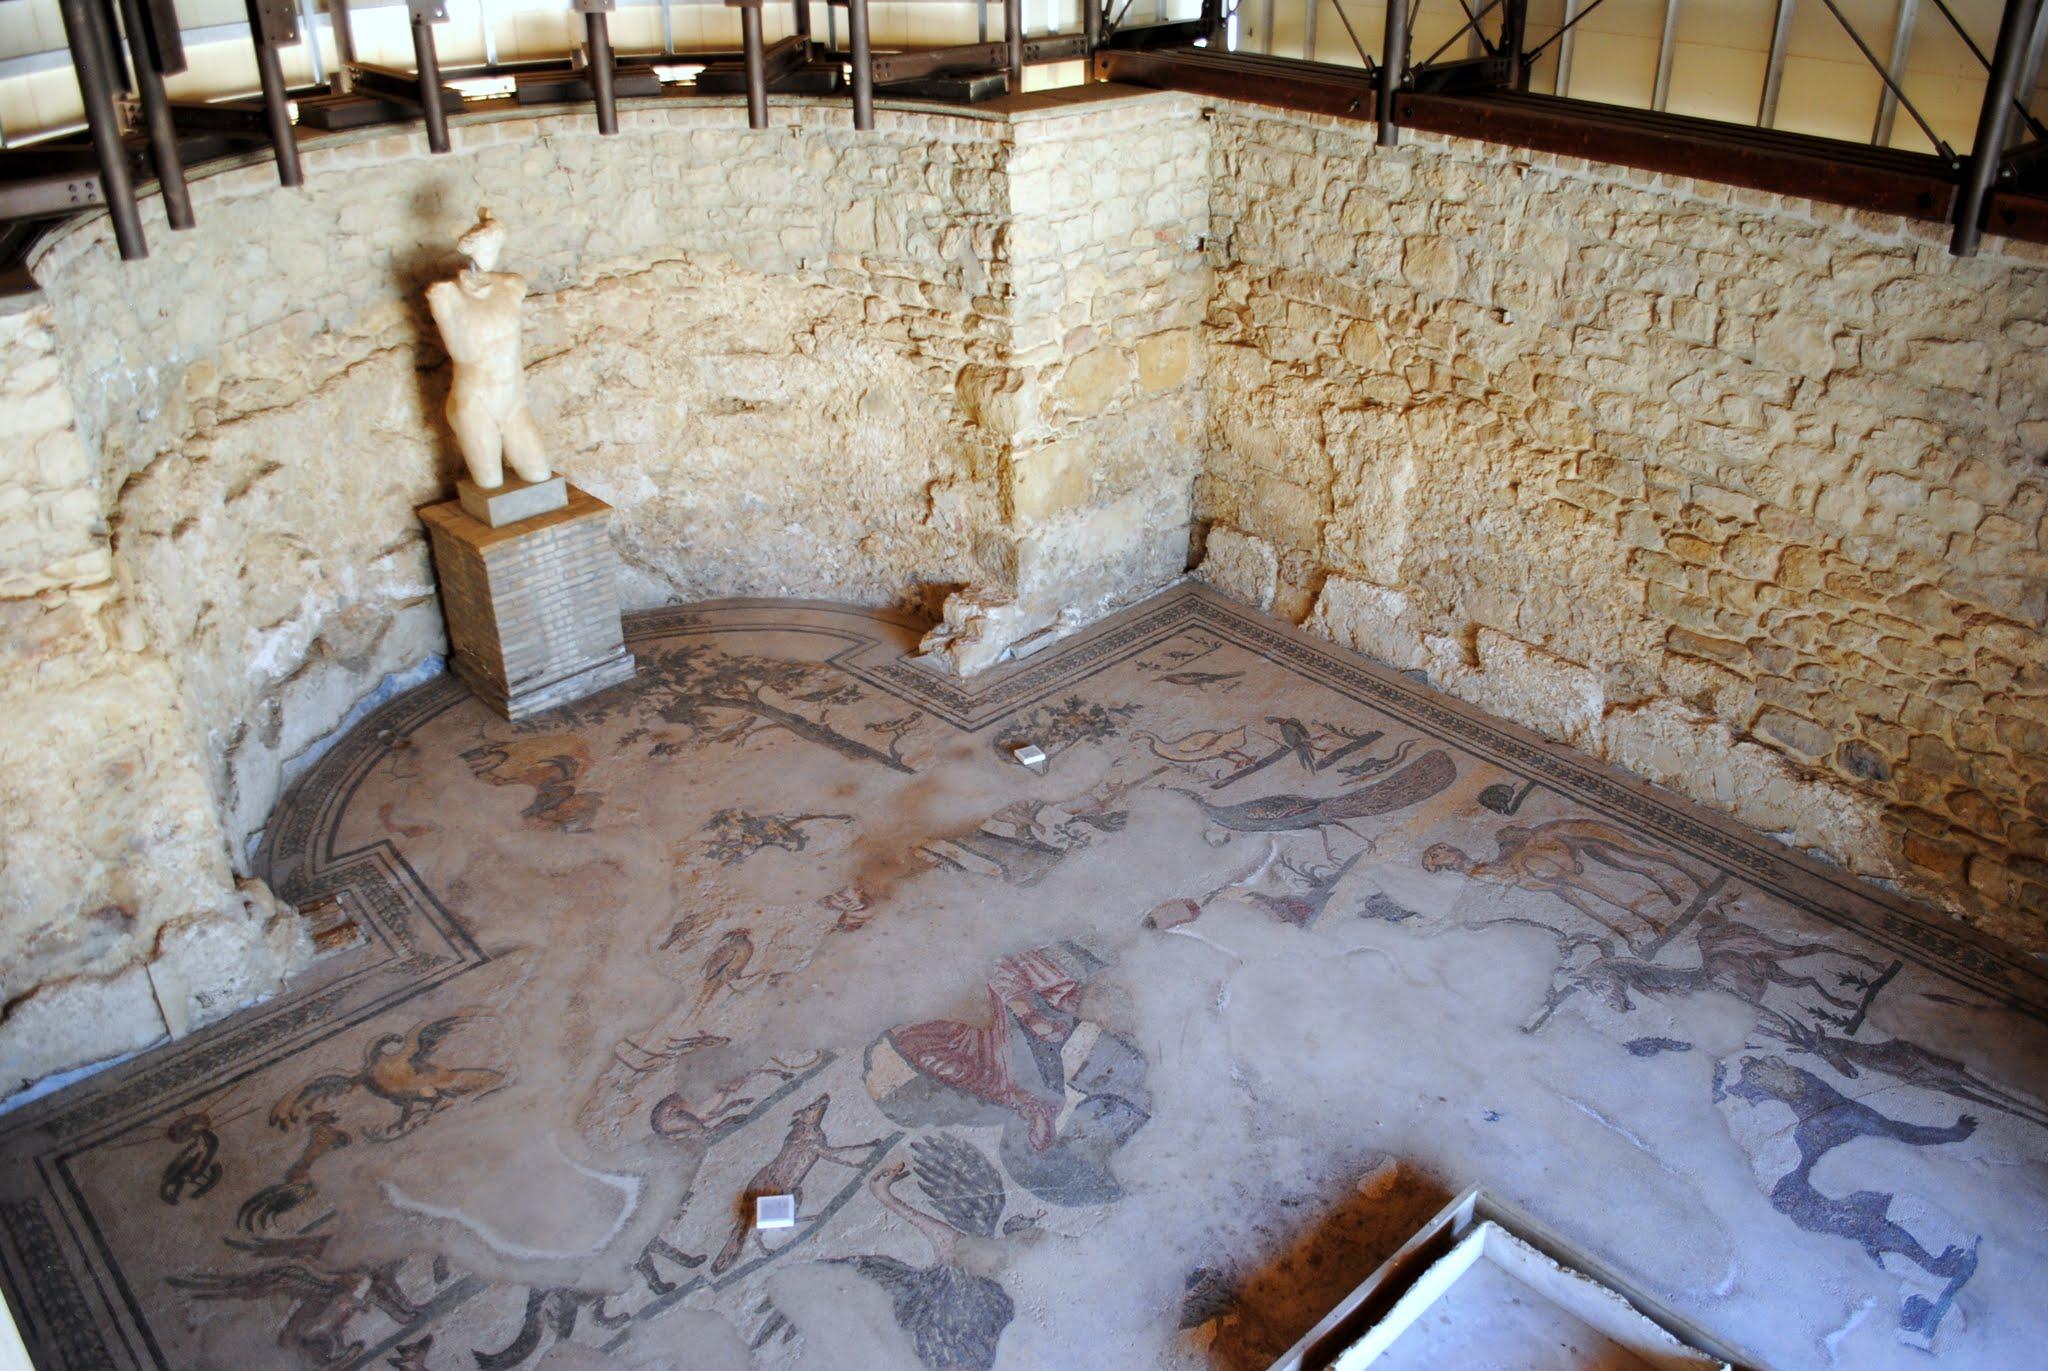 My Photos: Italy -- Mosaics -- Sicily -- Piazza Armerina -- The Orpheus Mosaic